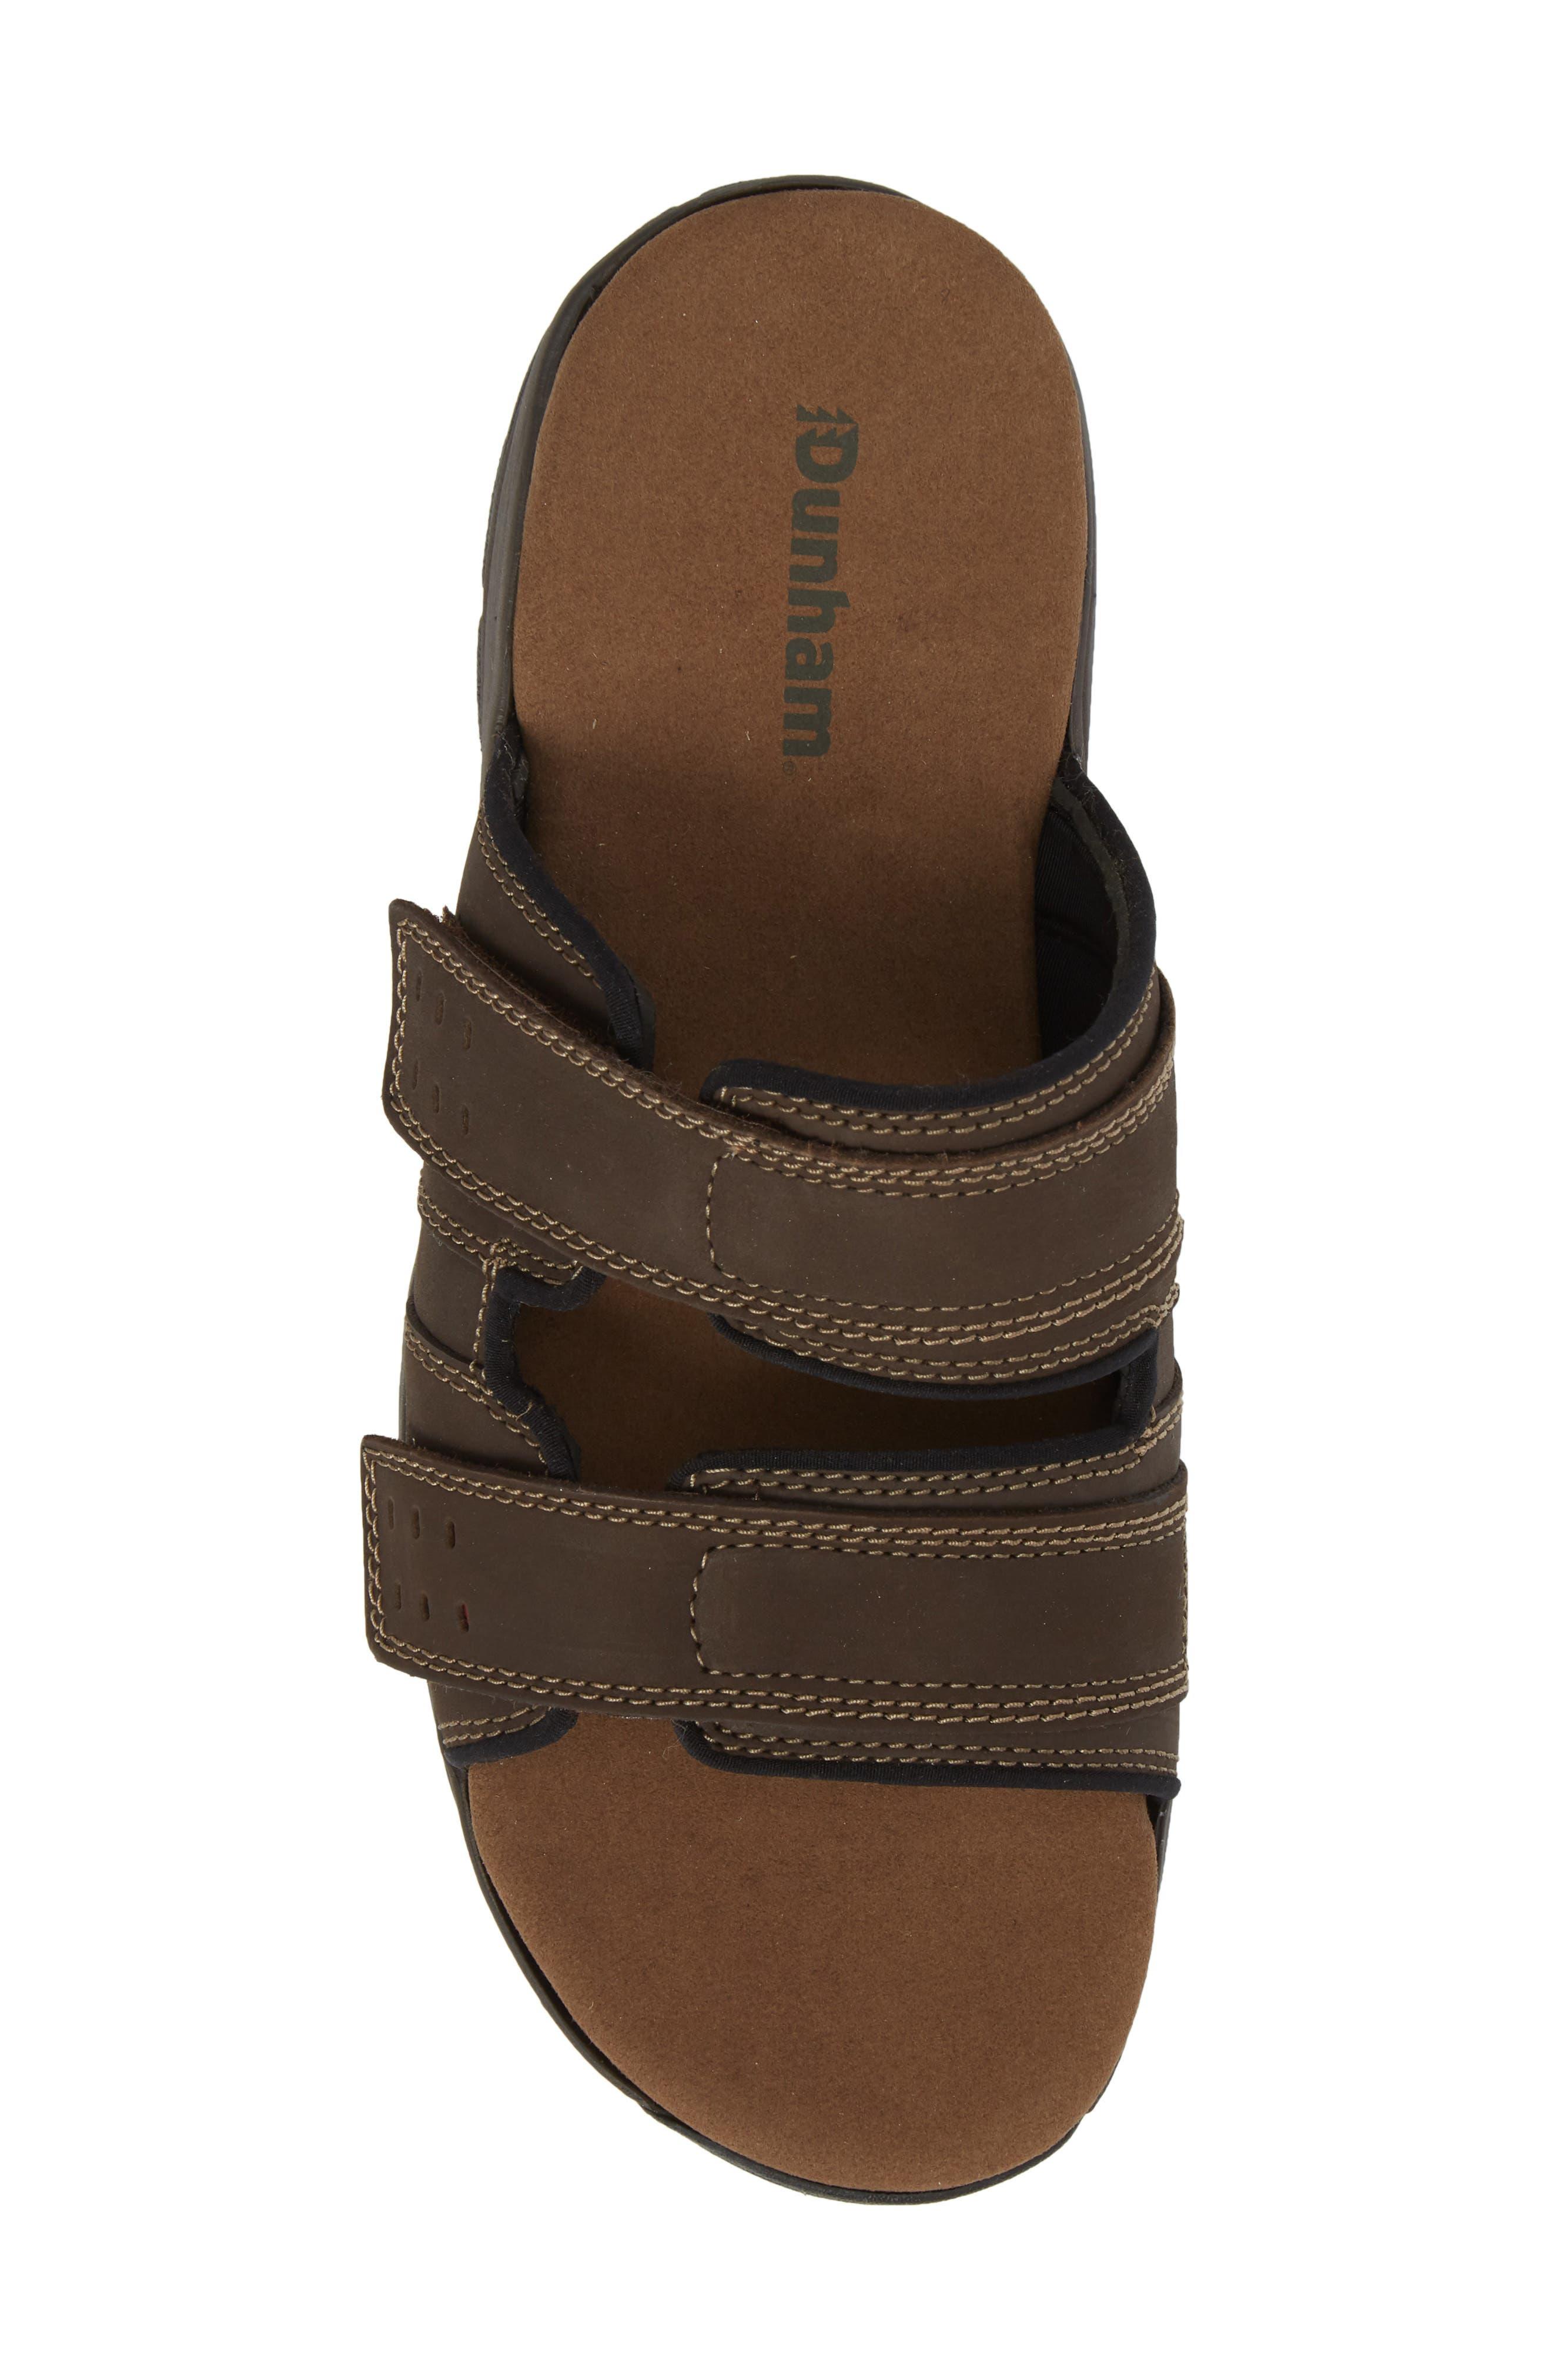 Newport Slide Sandal,                             Alternate thumbnail 5, color,                             DARK BROWN LEATHER